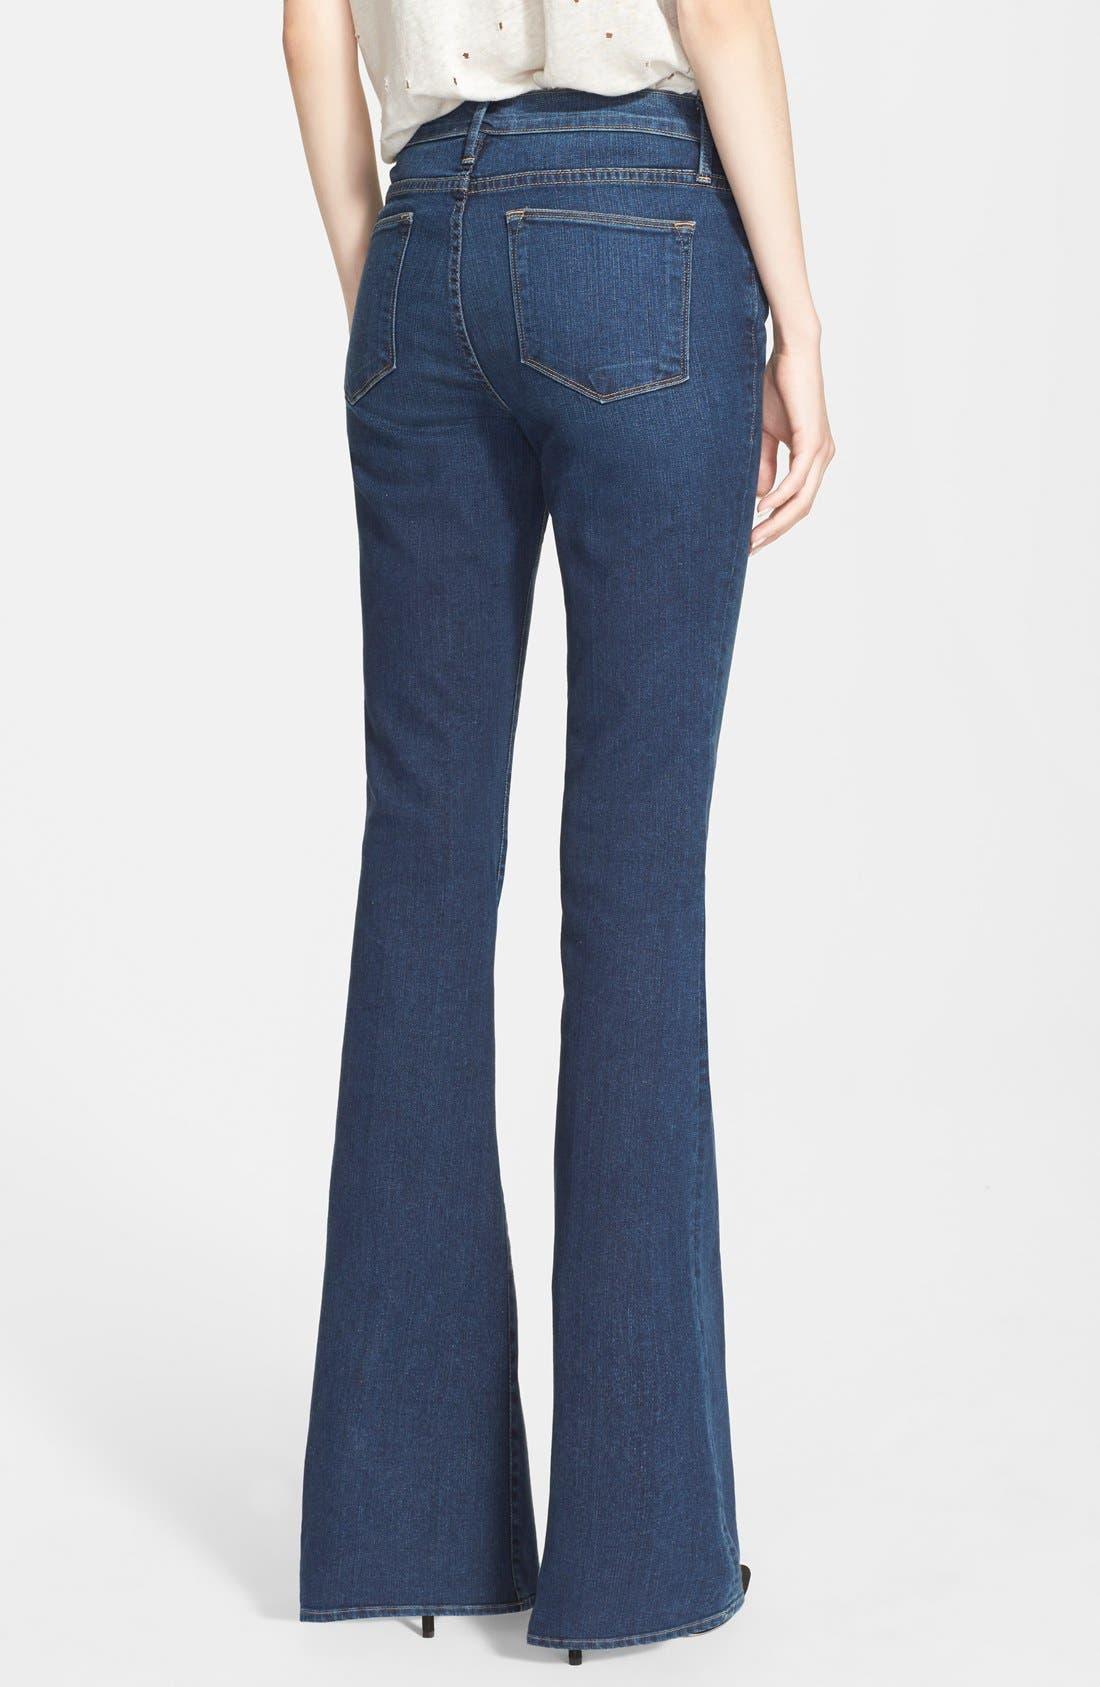 FRAME, Denim 'Le High Flare' Flare Leg Jeans, Alternate thumbnail 6, color, 401